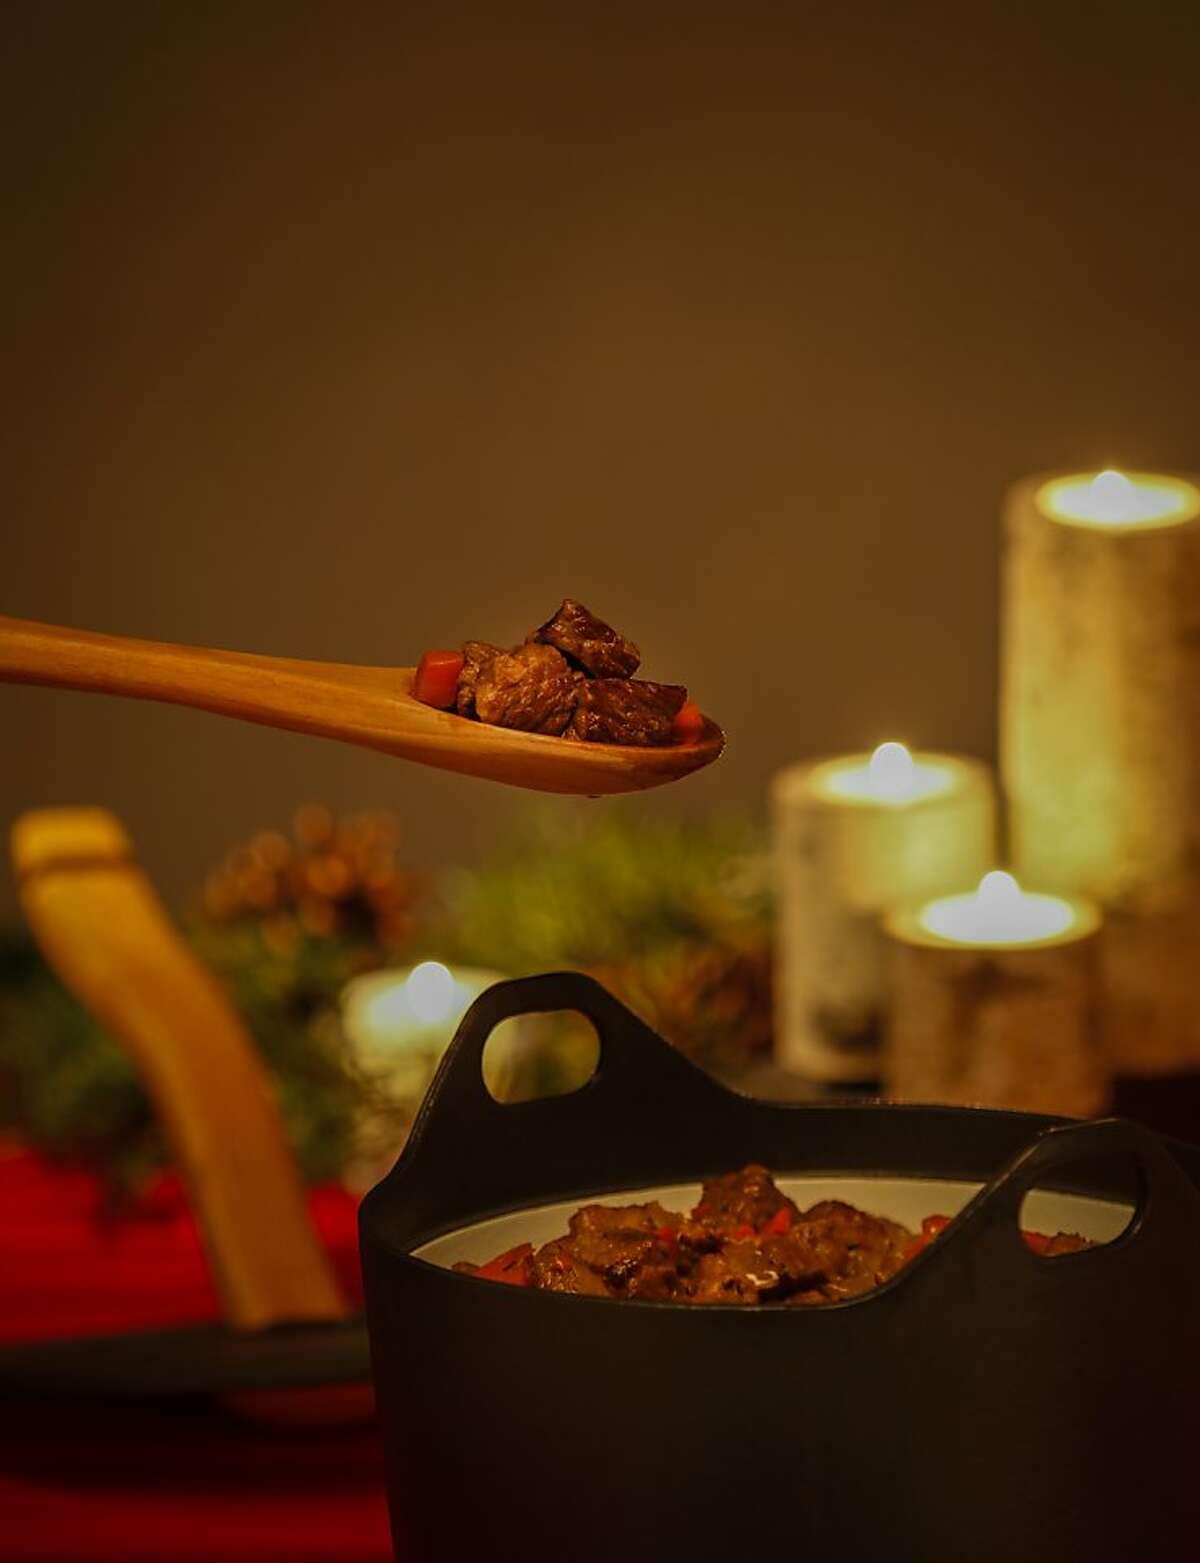 Karelian stew in a sarpaneva cast iron pot is seen on Tuesday, Dec. 3, 2013 in San Francisco, Calif.